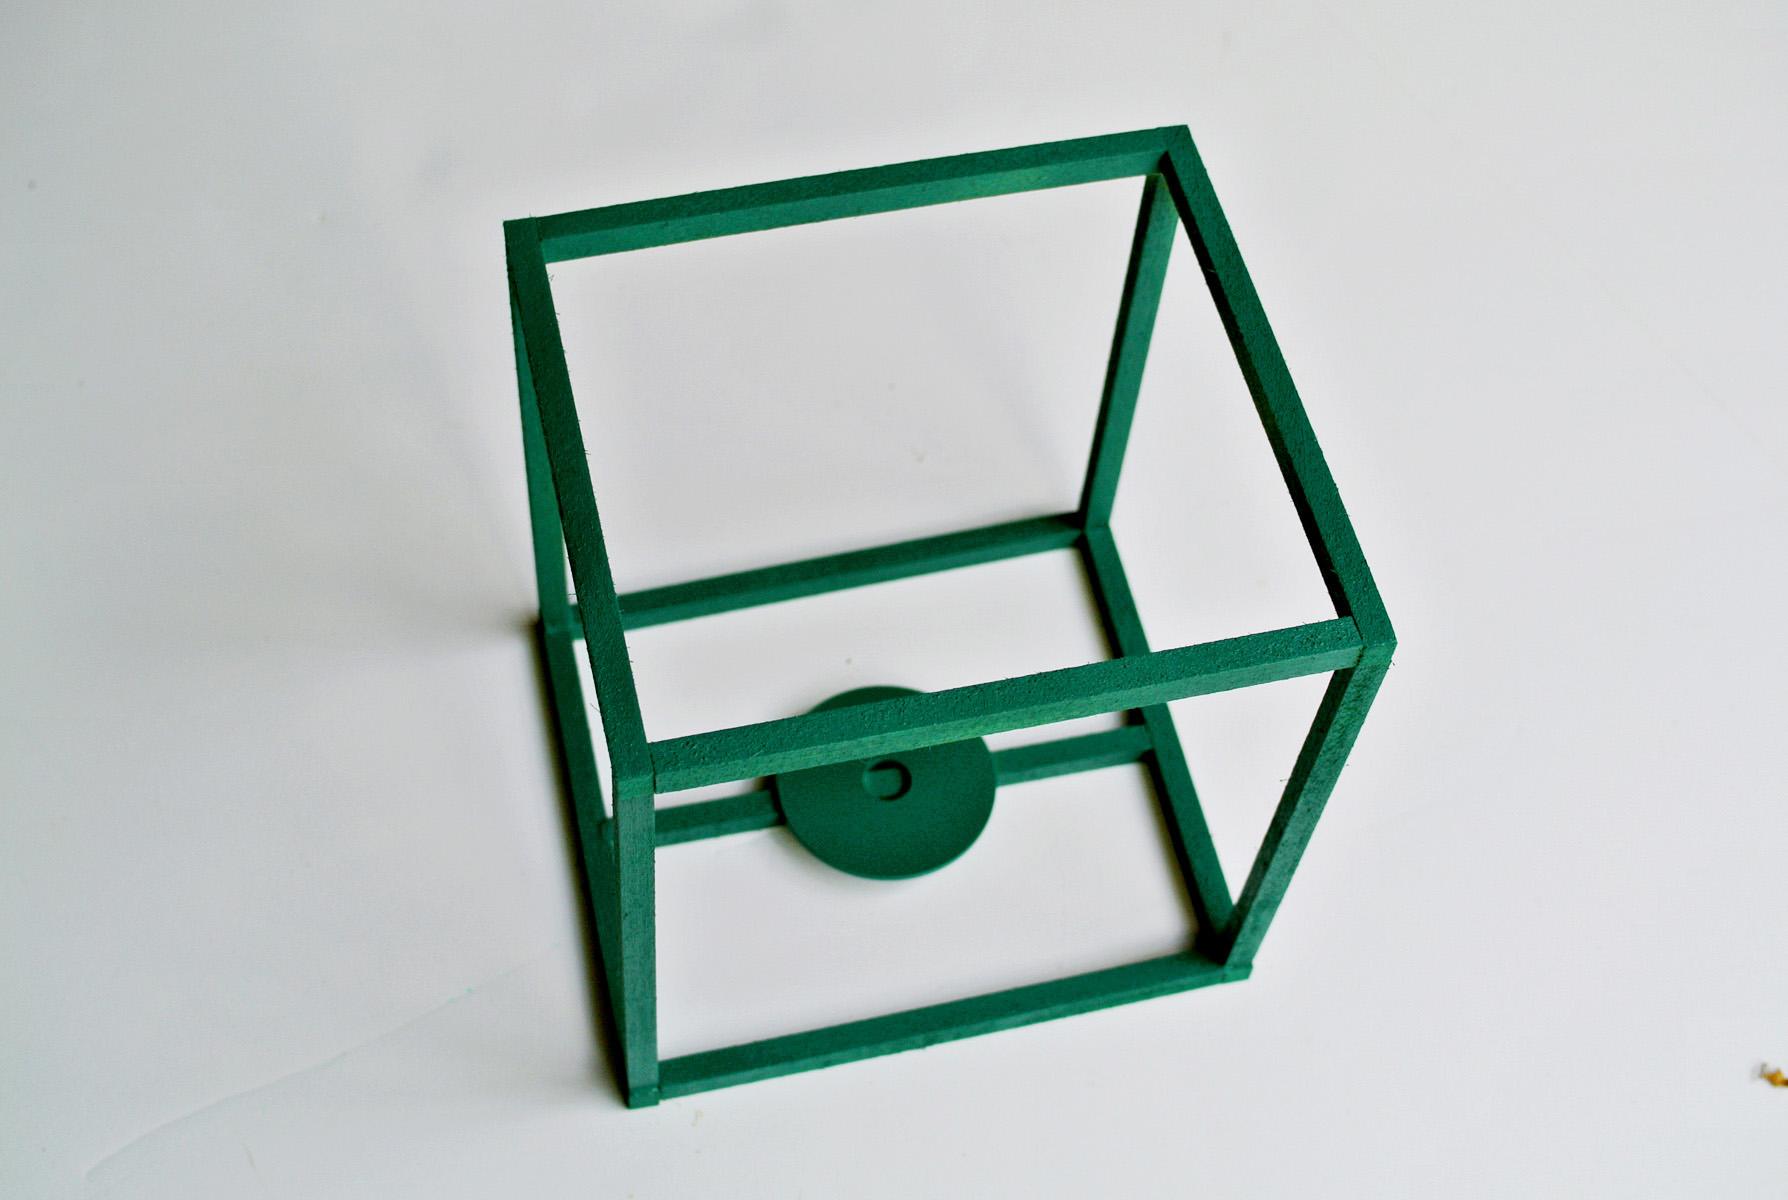 DIY cube lantern